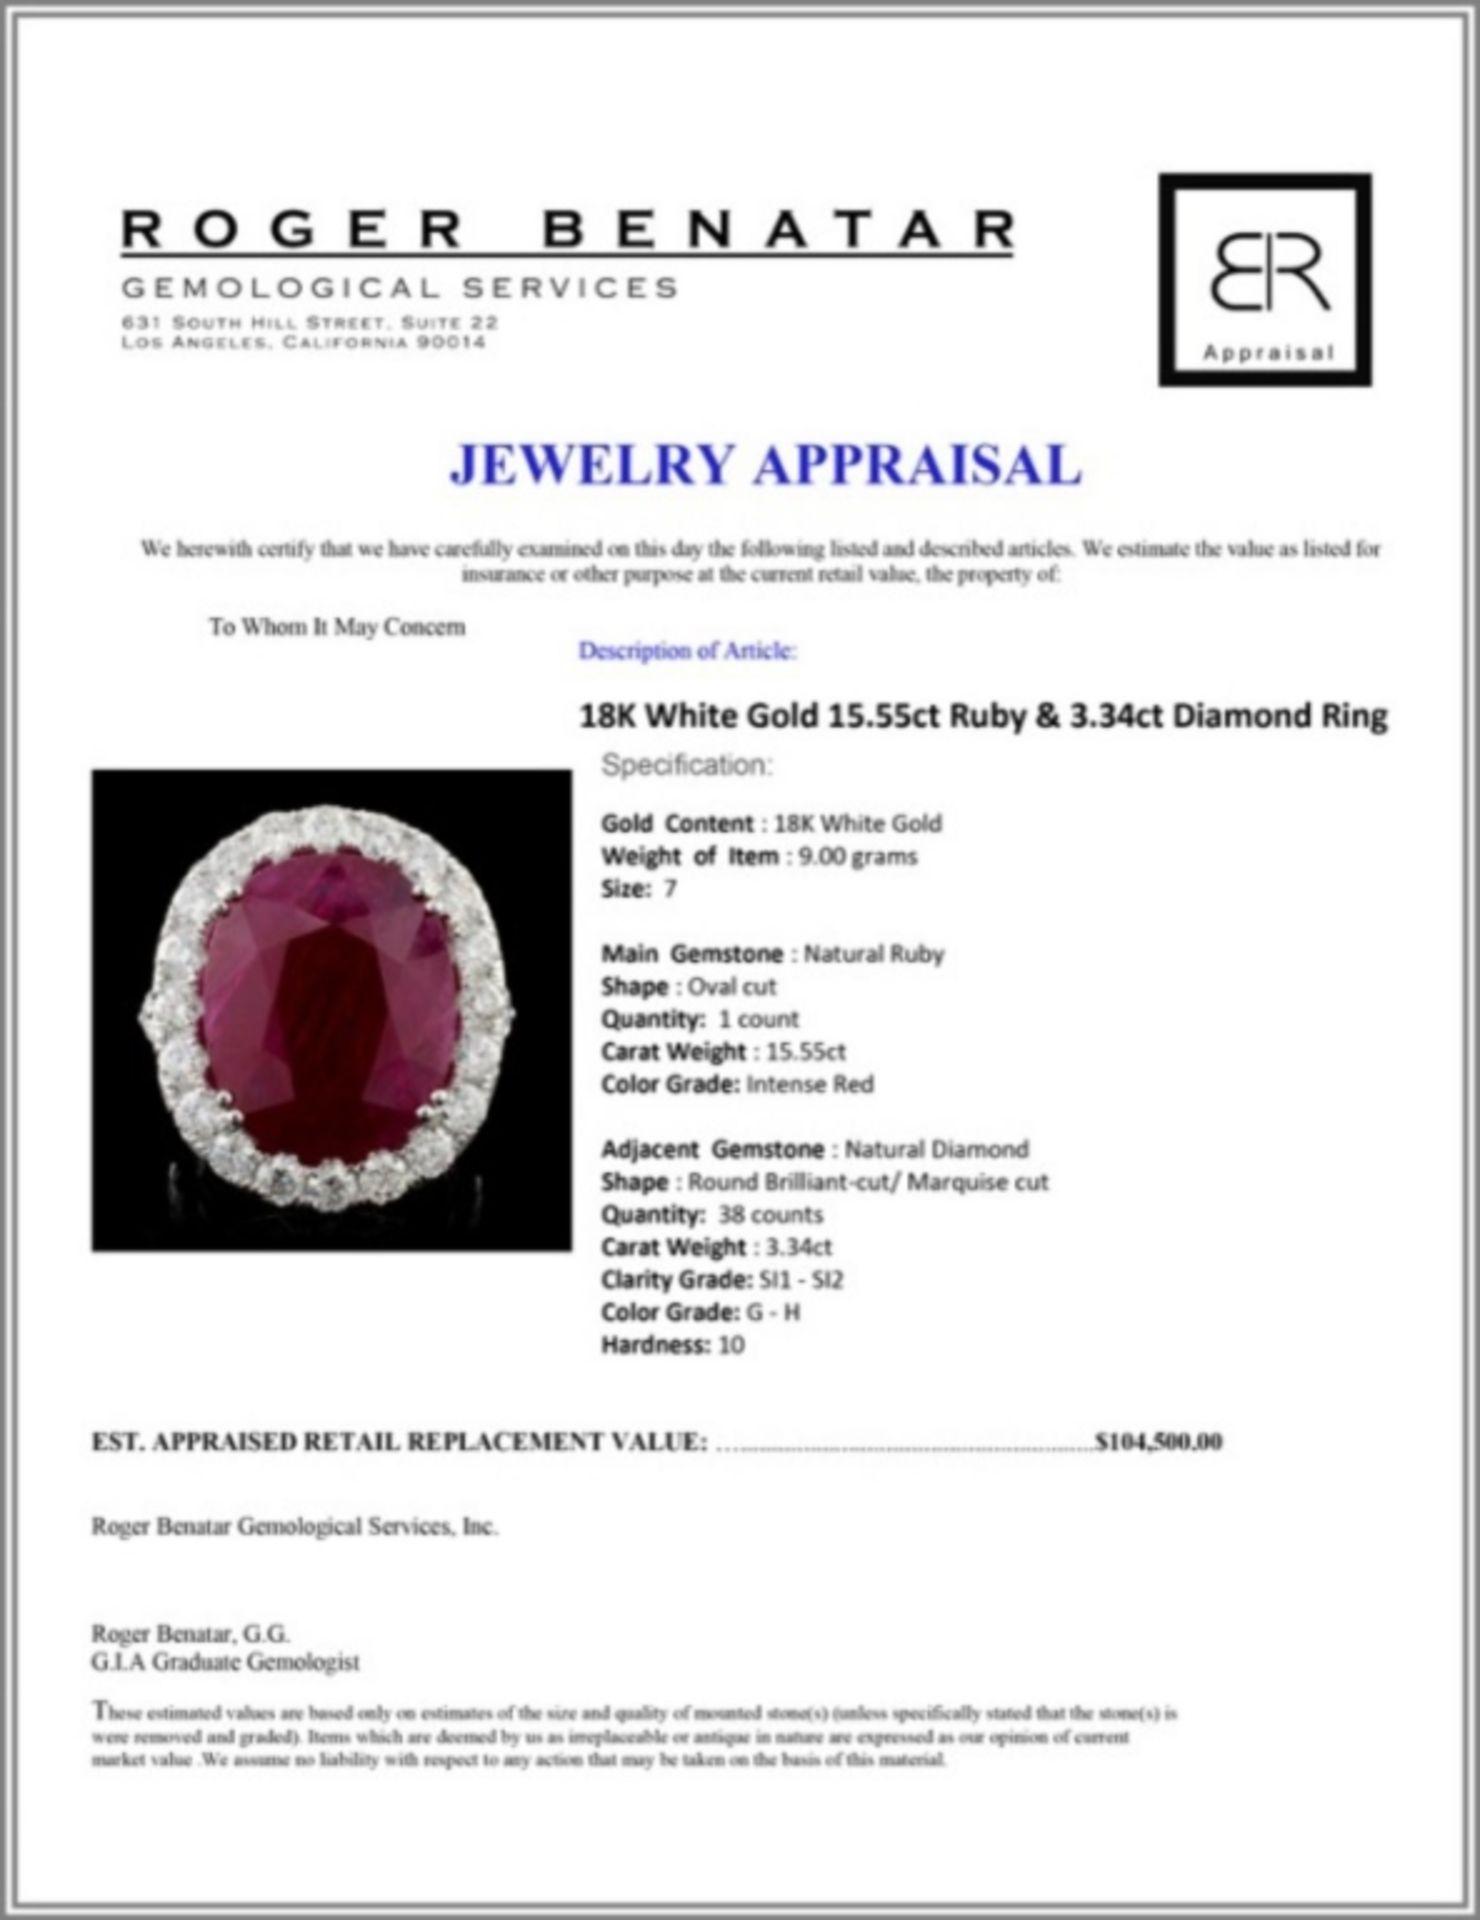 18K White Gold 15.55ct Ruby & 3.34ct Diamond Ring - Image 4 of 4